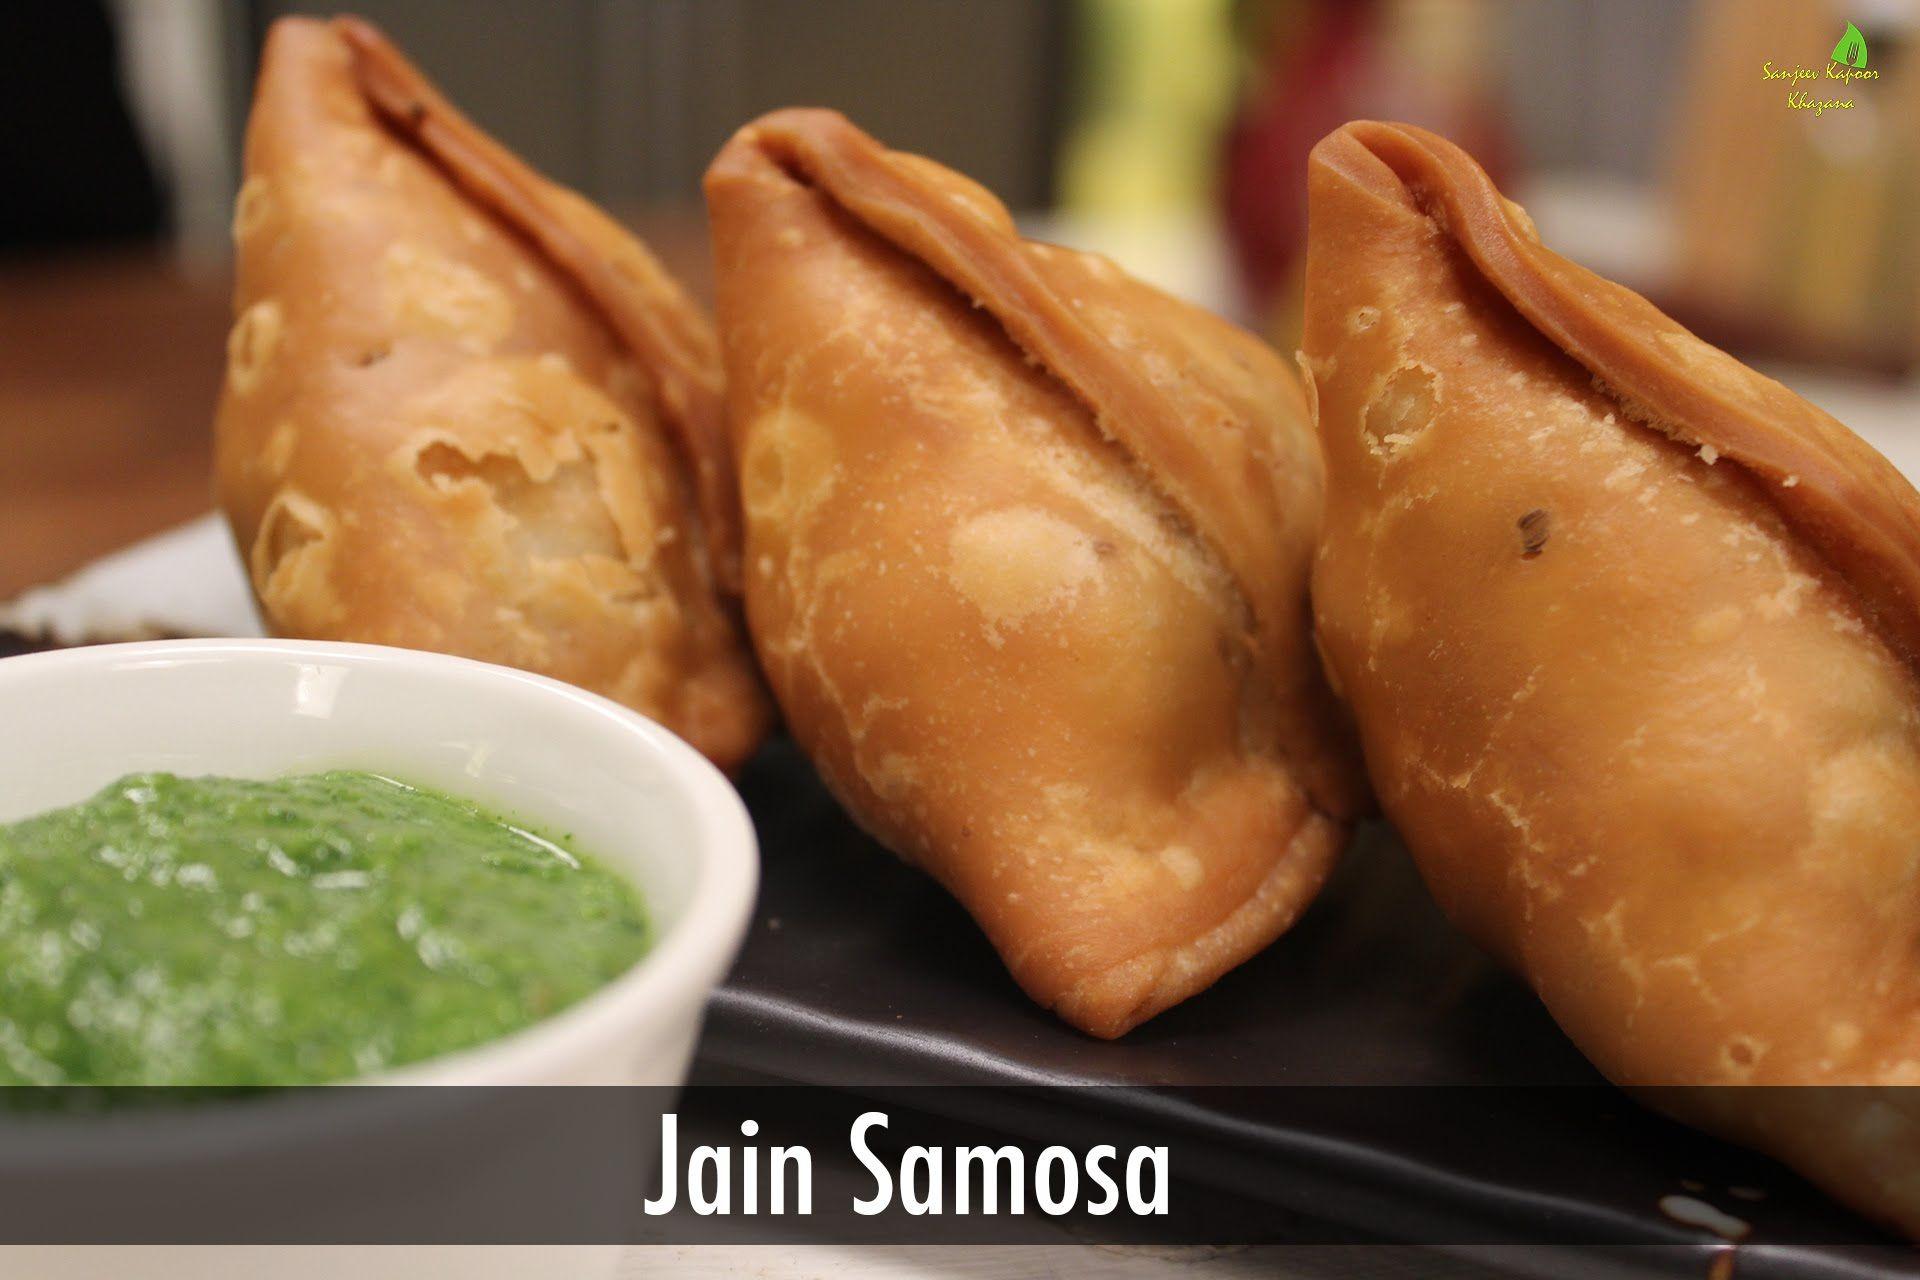 Jain samosa jain recipes sanjeev kapoor khazana sanjeev kapoor jain samosa jain recipes sanjeev kapoor khazana forumfinder Images